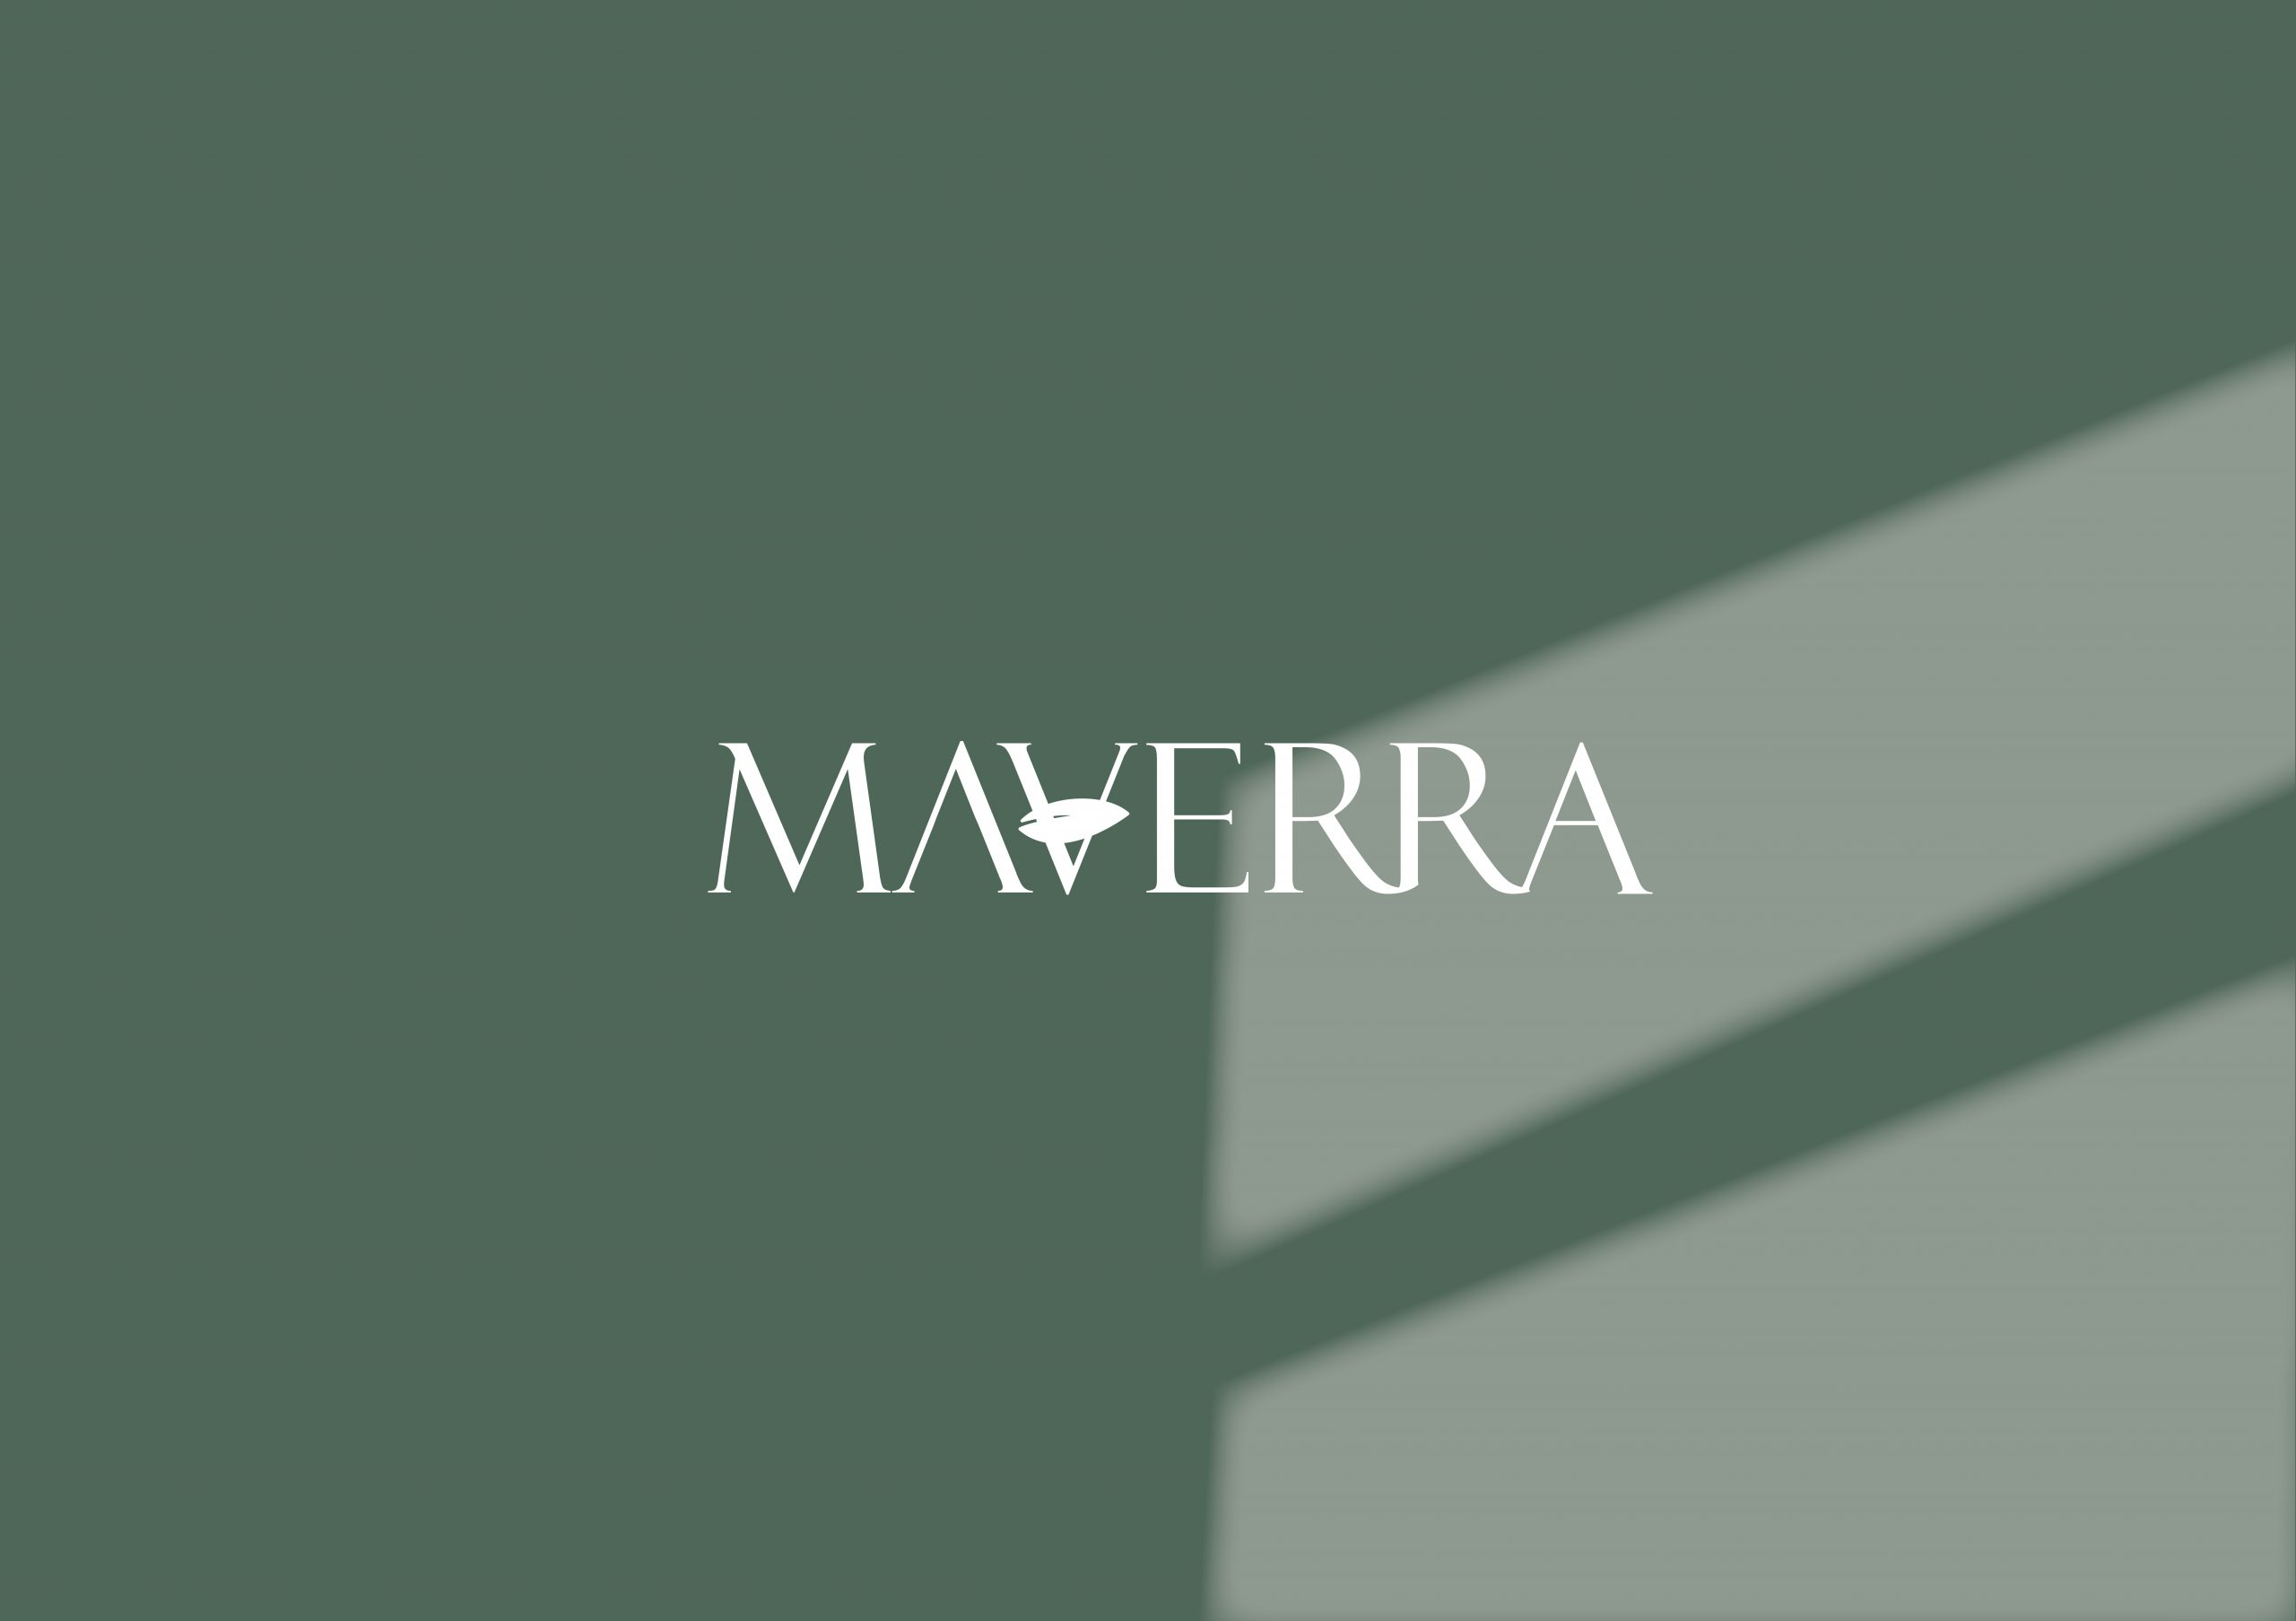 Mavvera purpose 01 scaled